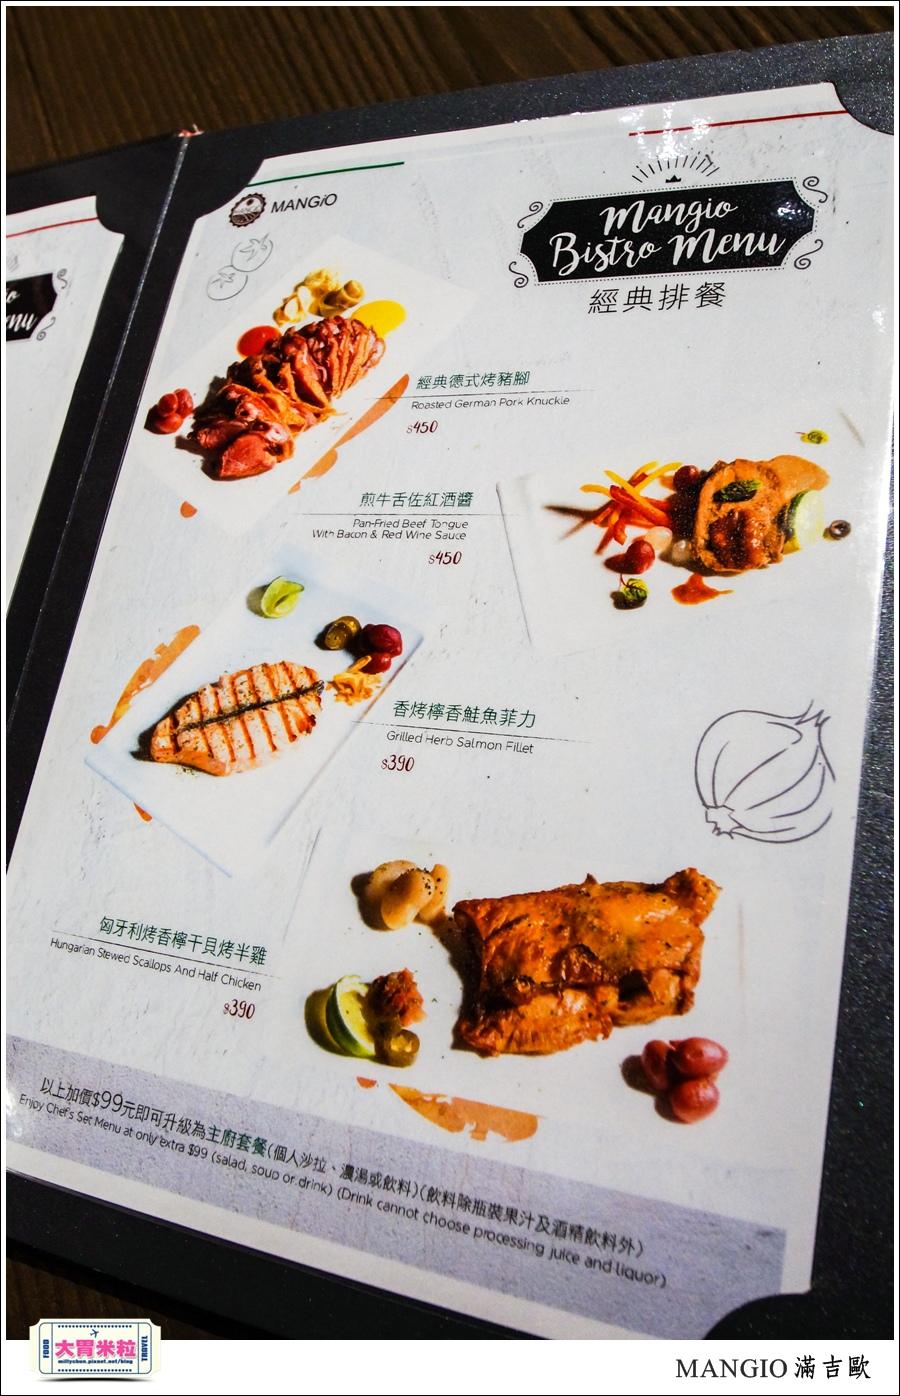 MANGiO Bistro 滿吉歐義式樂活餐酒館@台北餐酒館推薦@大胃米粒0060.jpg